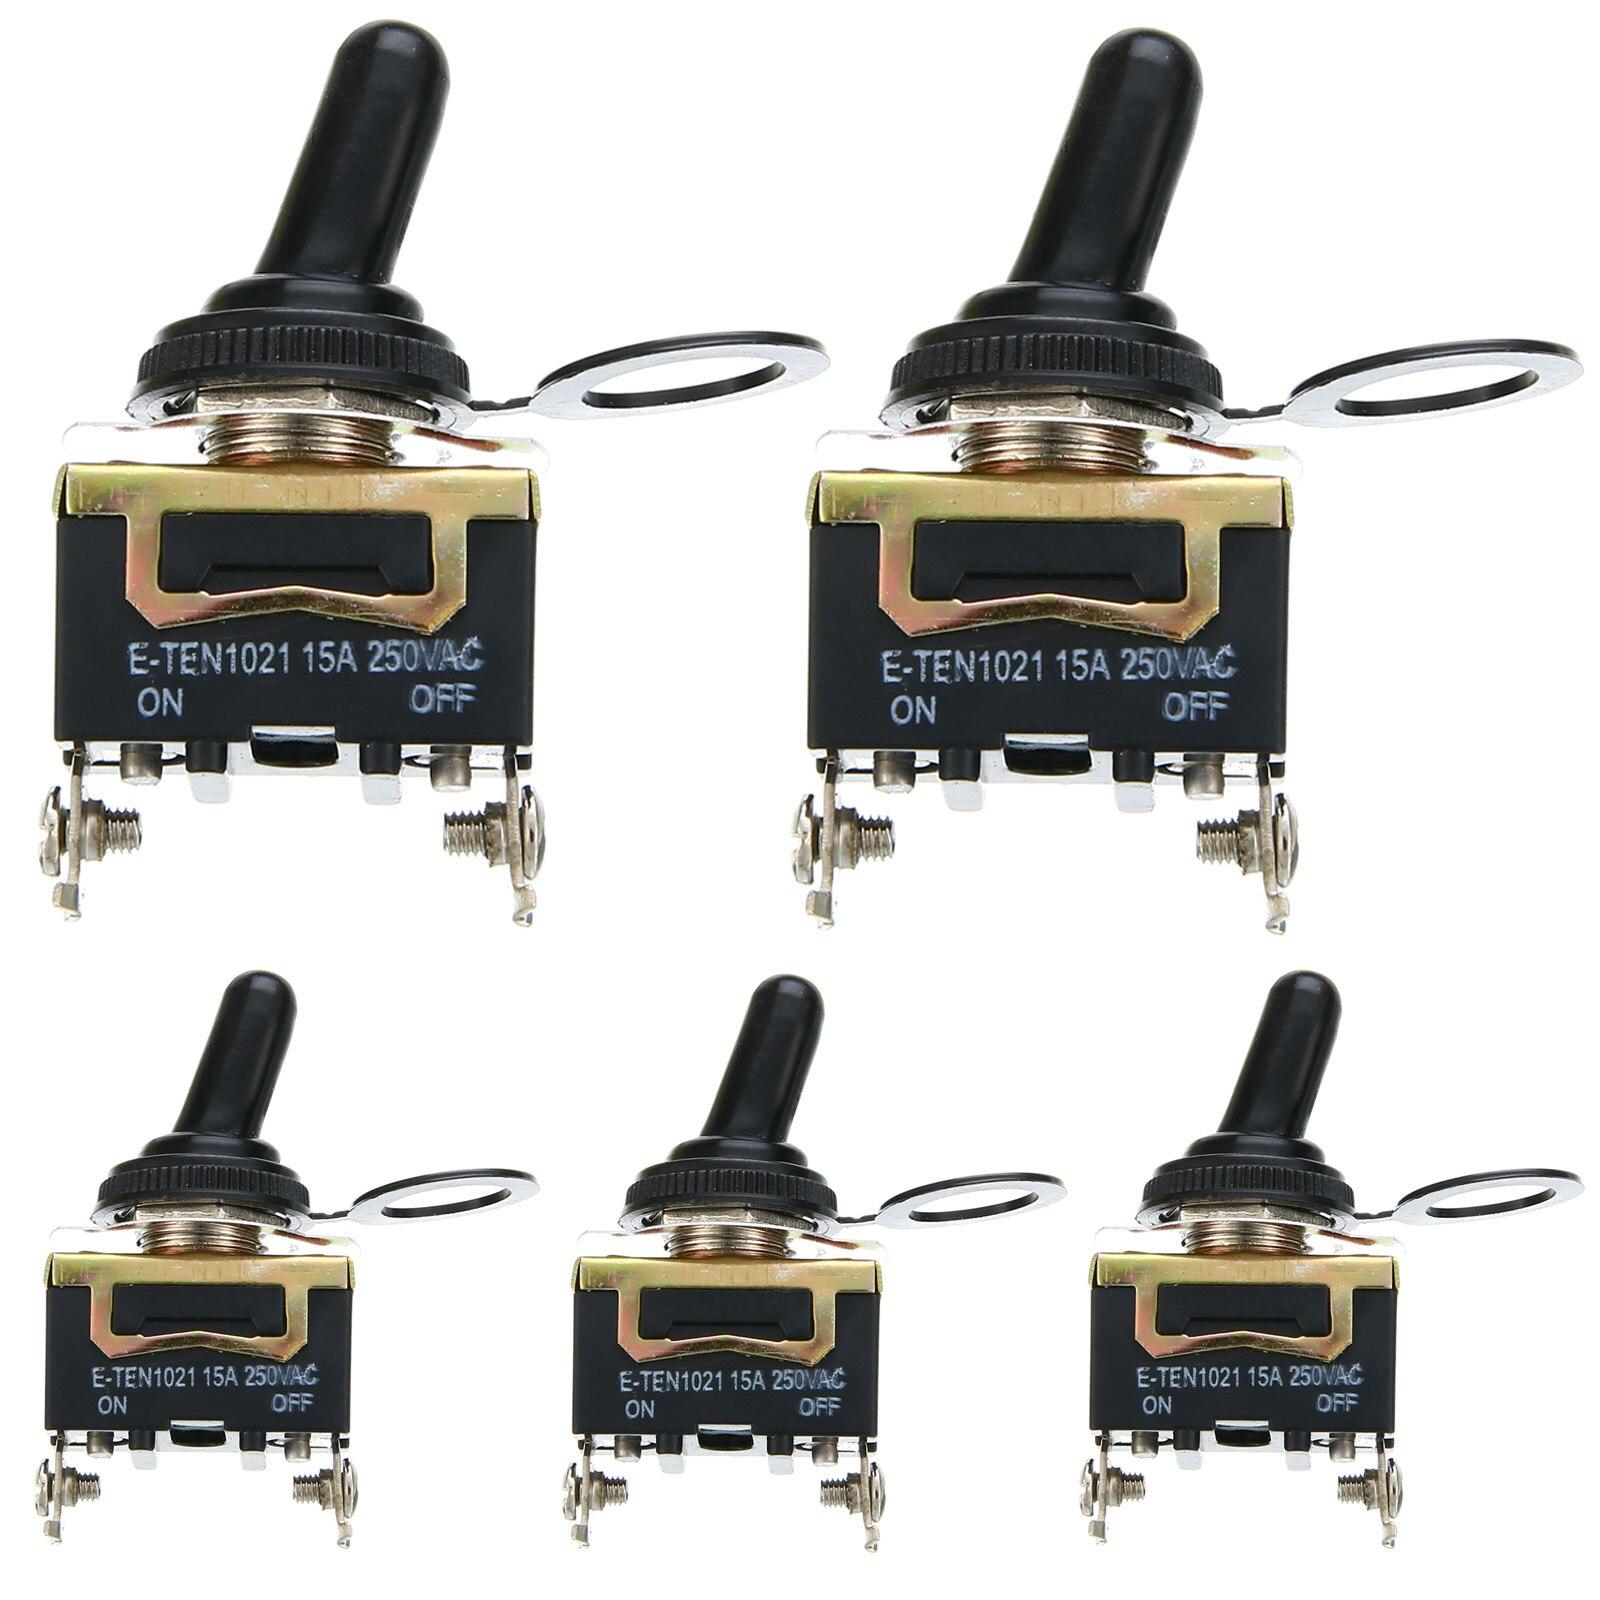 цена на Mayitr 5pcs SPST 2 Pin Rocker Switch Car Boat Heavy Duty 15A 250V ON/OFF Rocker Toggle Switches + Waterproof Boot